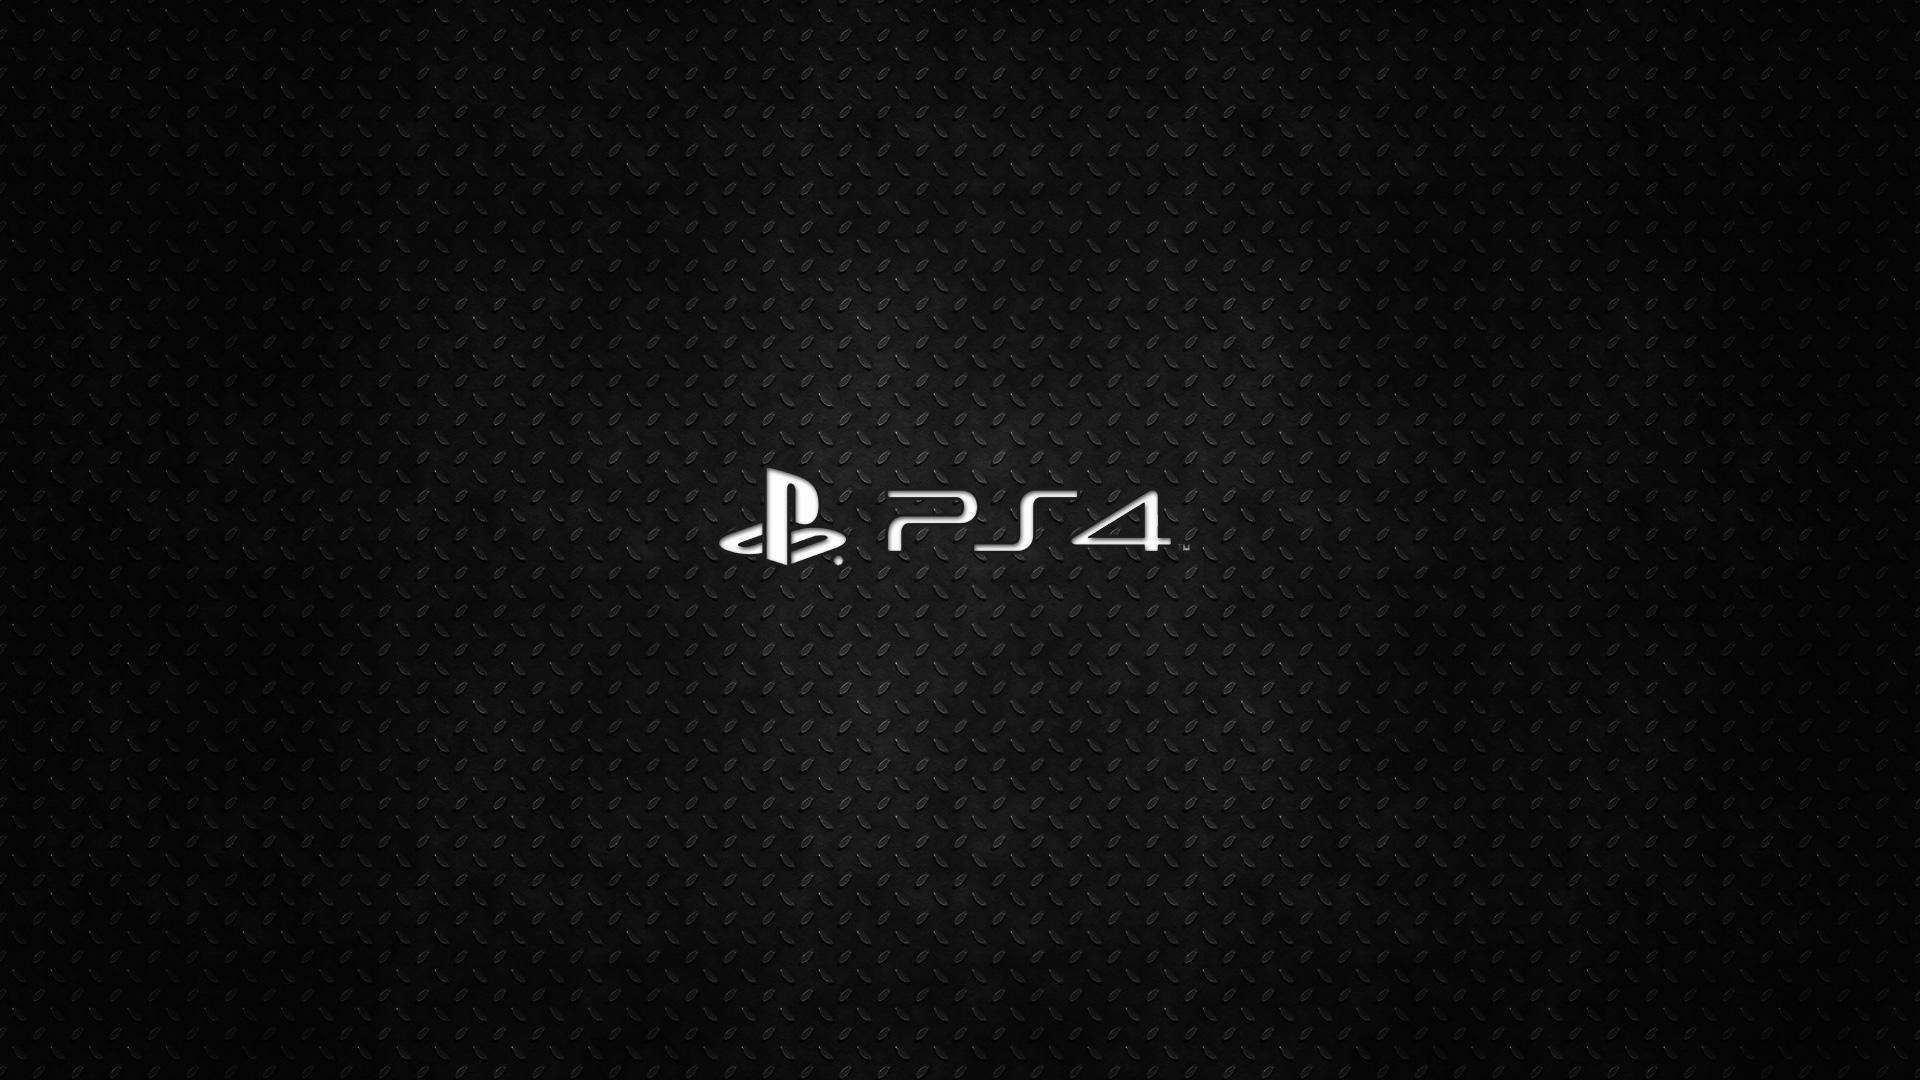 PS4 Logo HD Wallpaper Background 5880 Wallpaper HD Wallpaper GamesHD 1920x1080